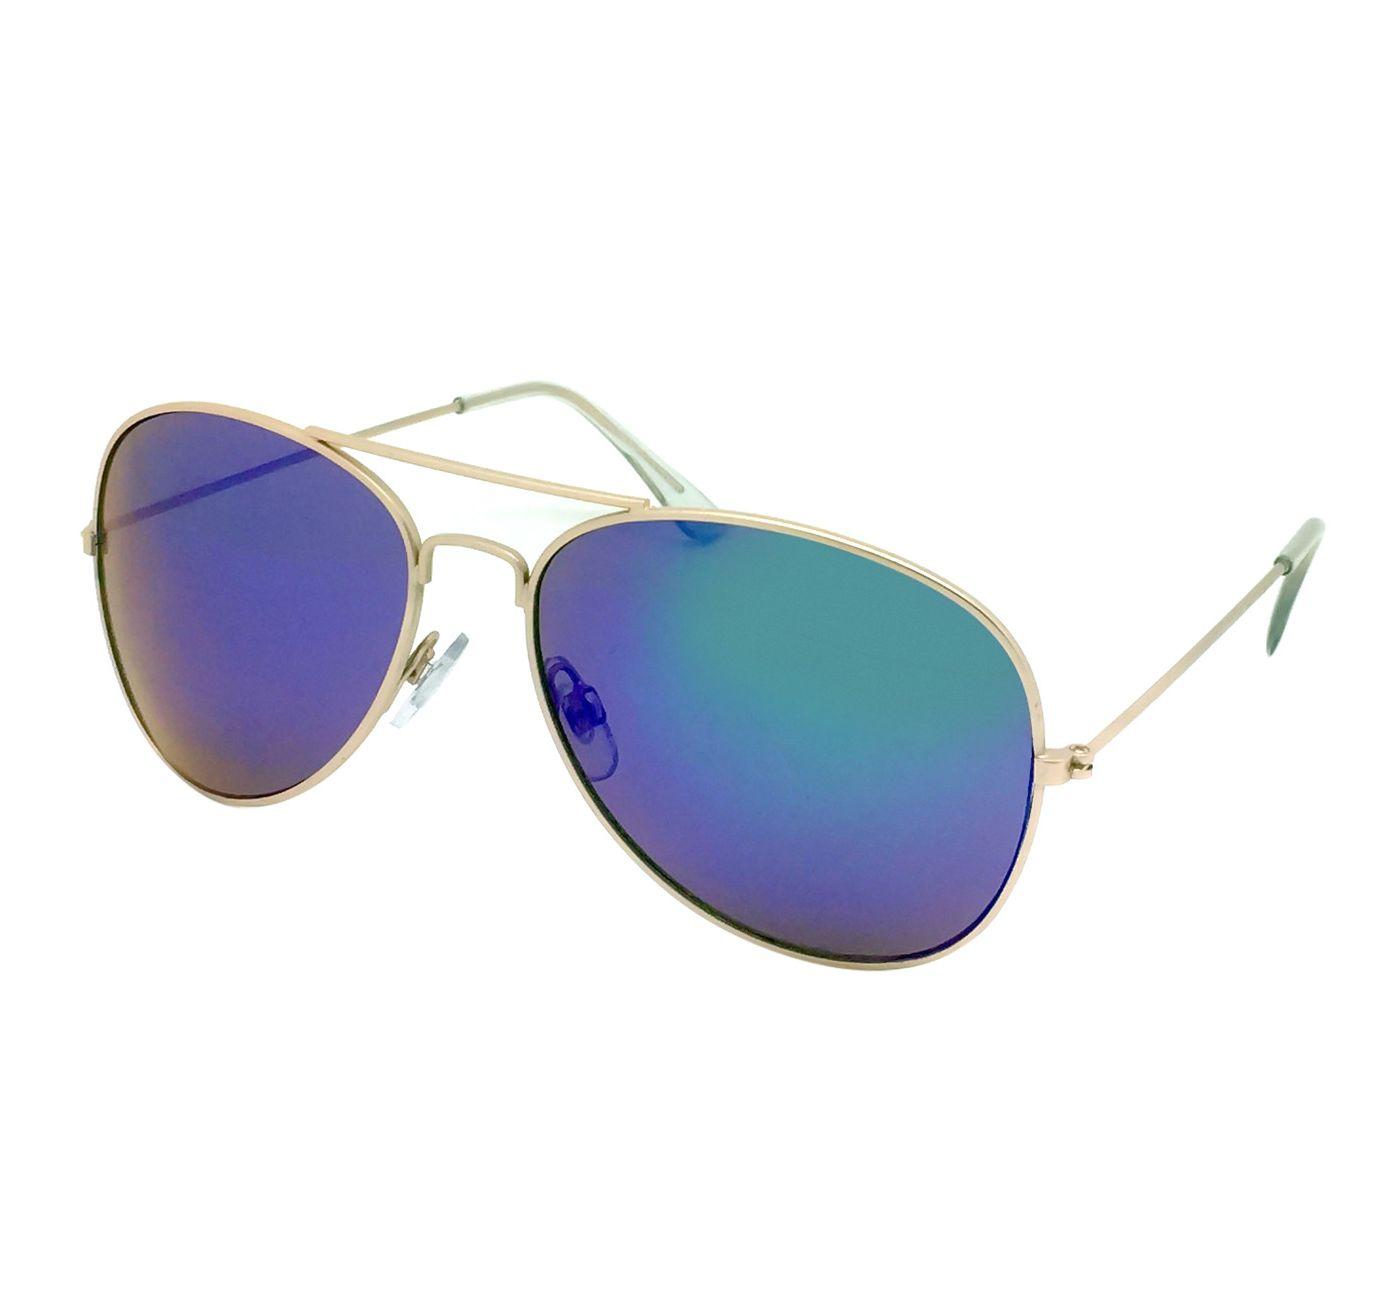 Women's Aviator Sunglasses w/ Blue Lenses - Wild Fable™ Gold - image 1 of 6